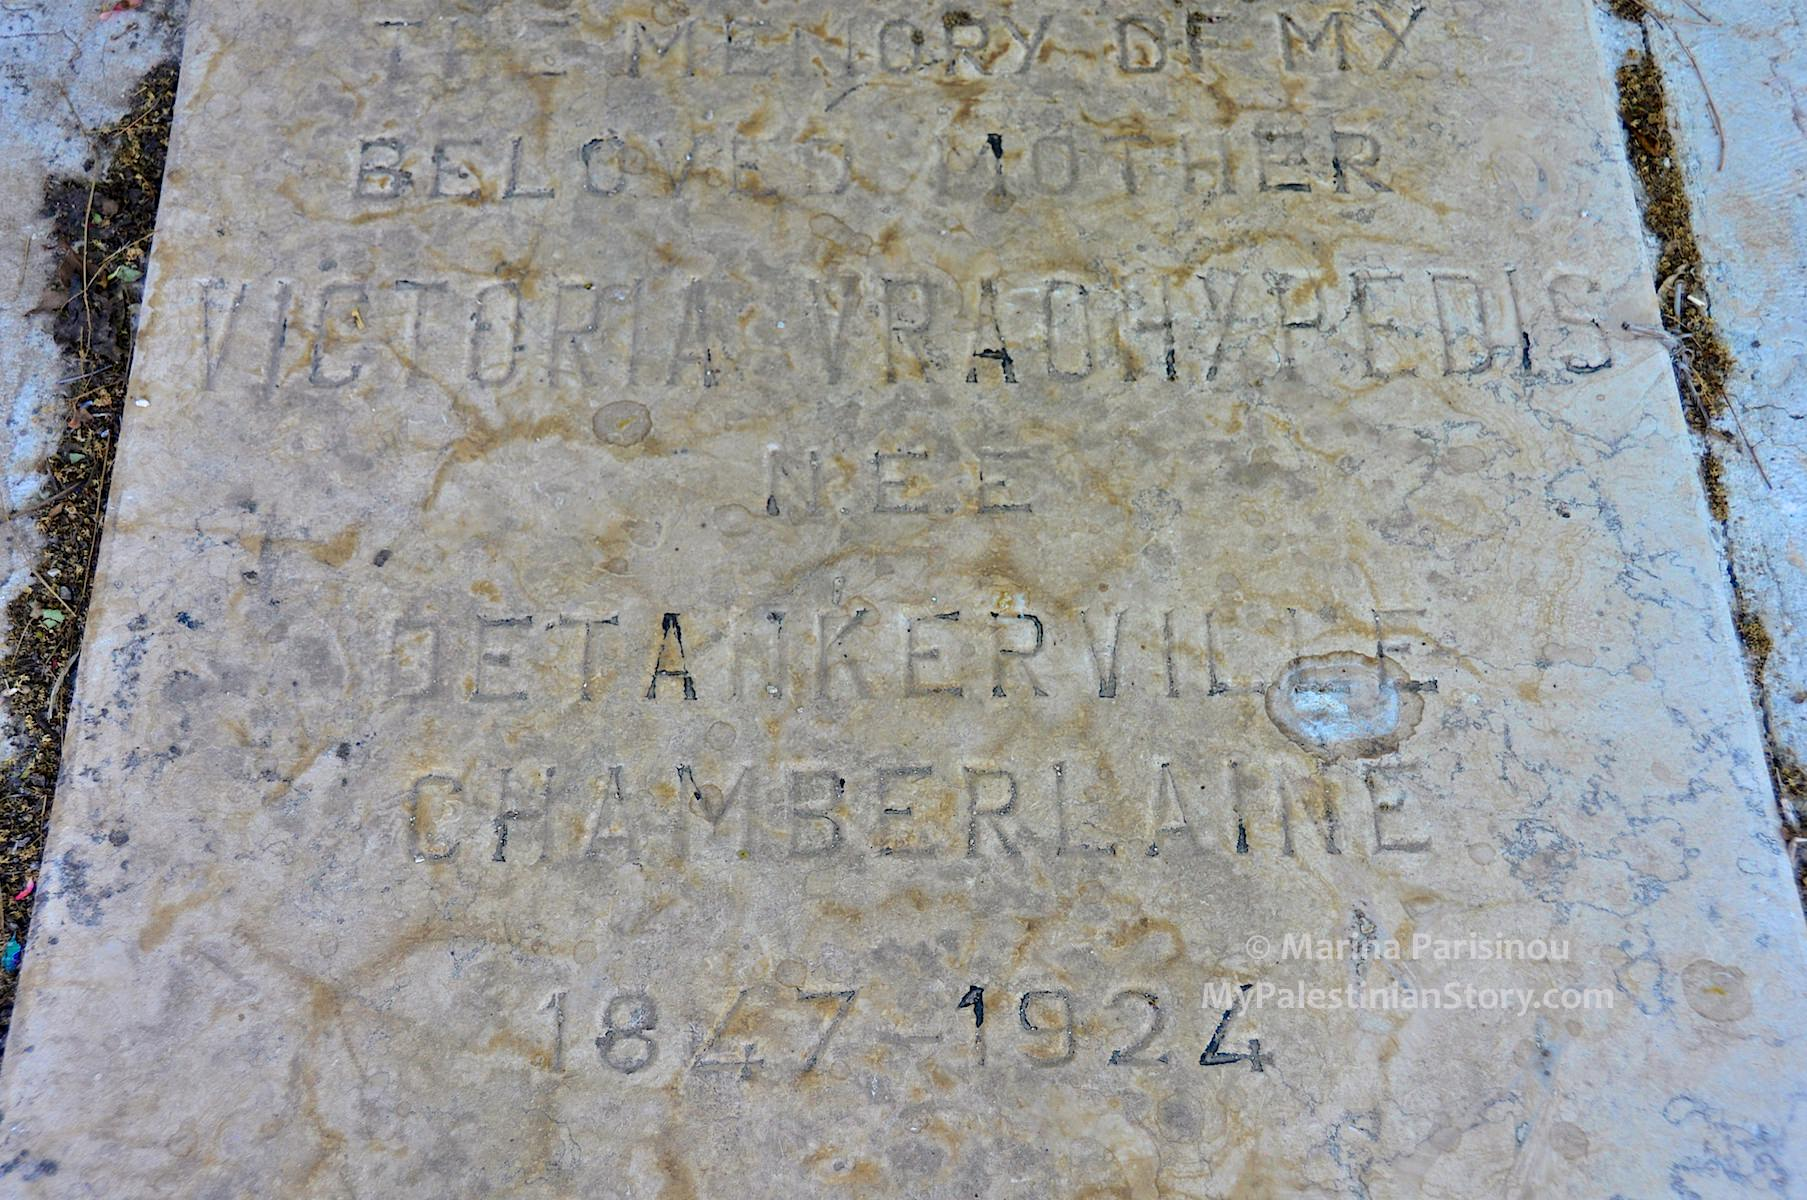 A Chamberlain tombstone: Victoria Vrahipedis, 1847-1924